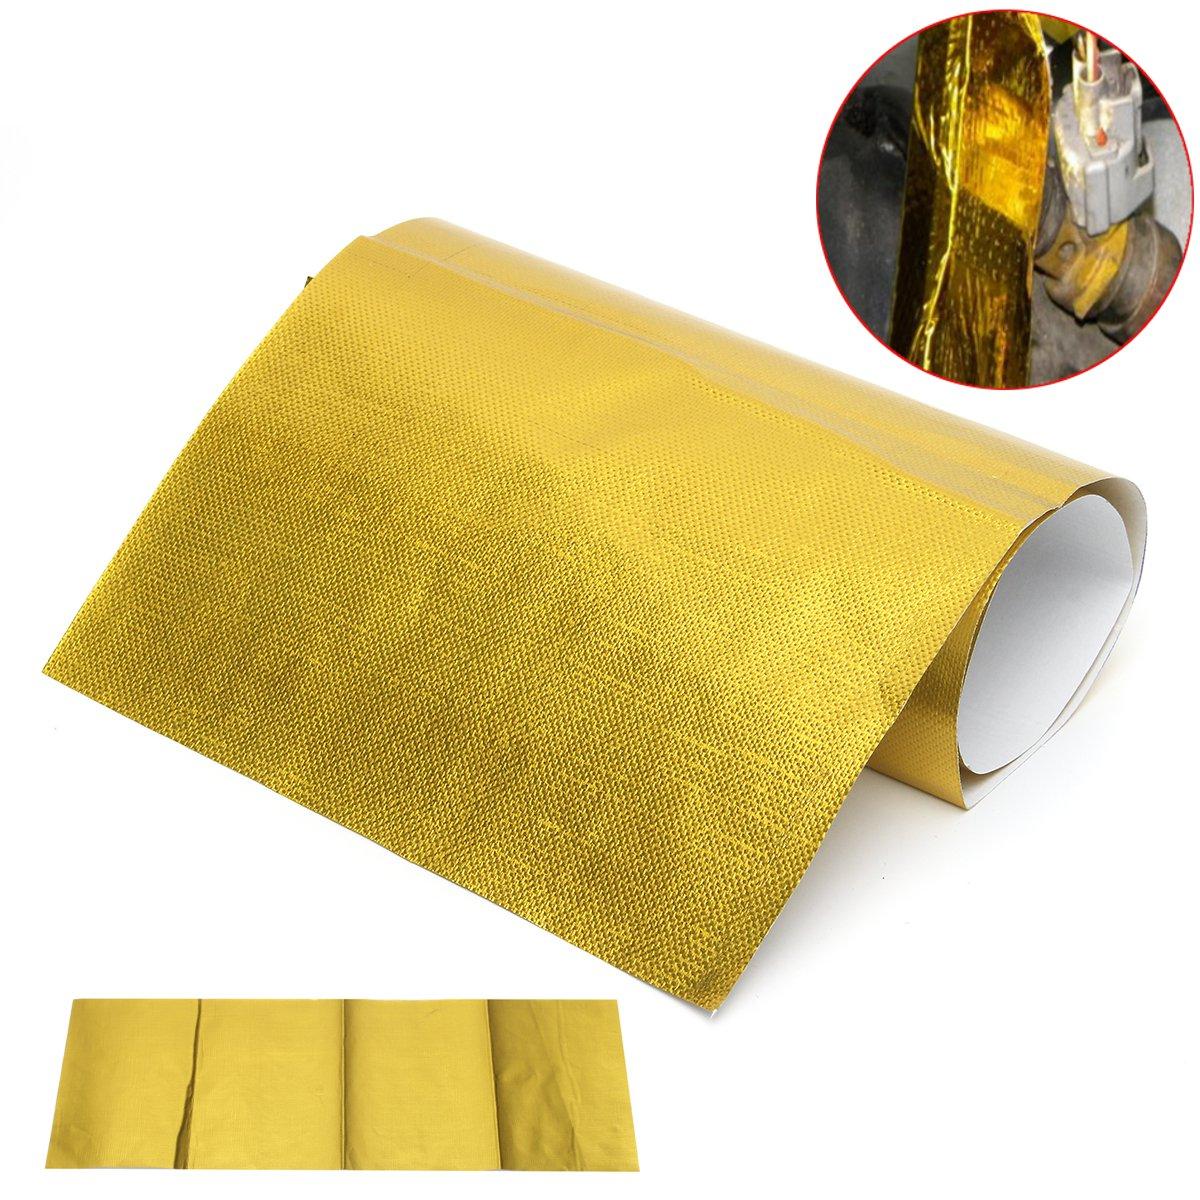 Self Adhesive Thermoshield Reflective Heat Shield Heatshield Tape Wire Wrap 1M